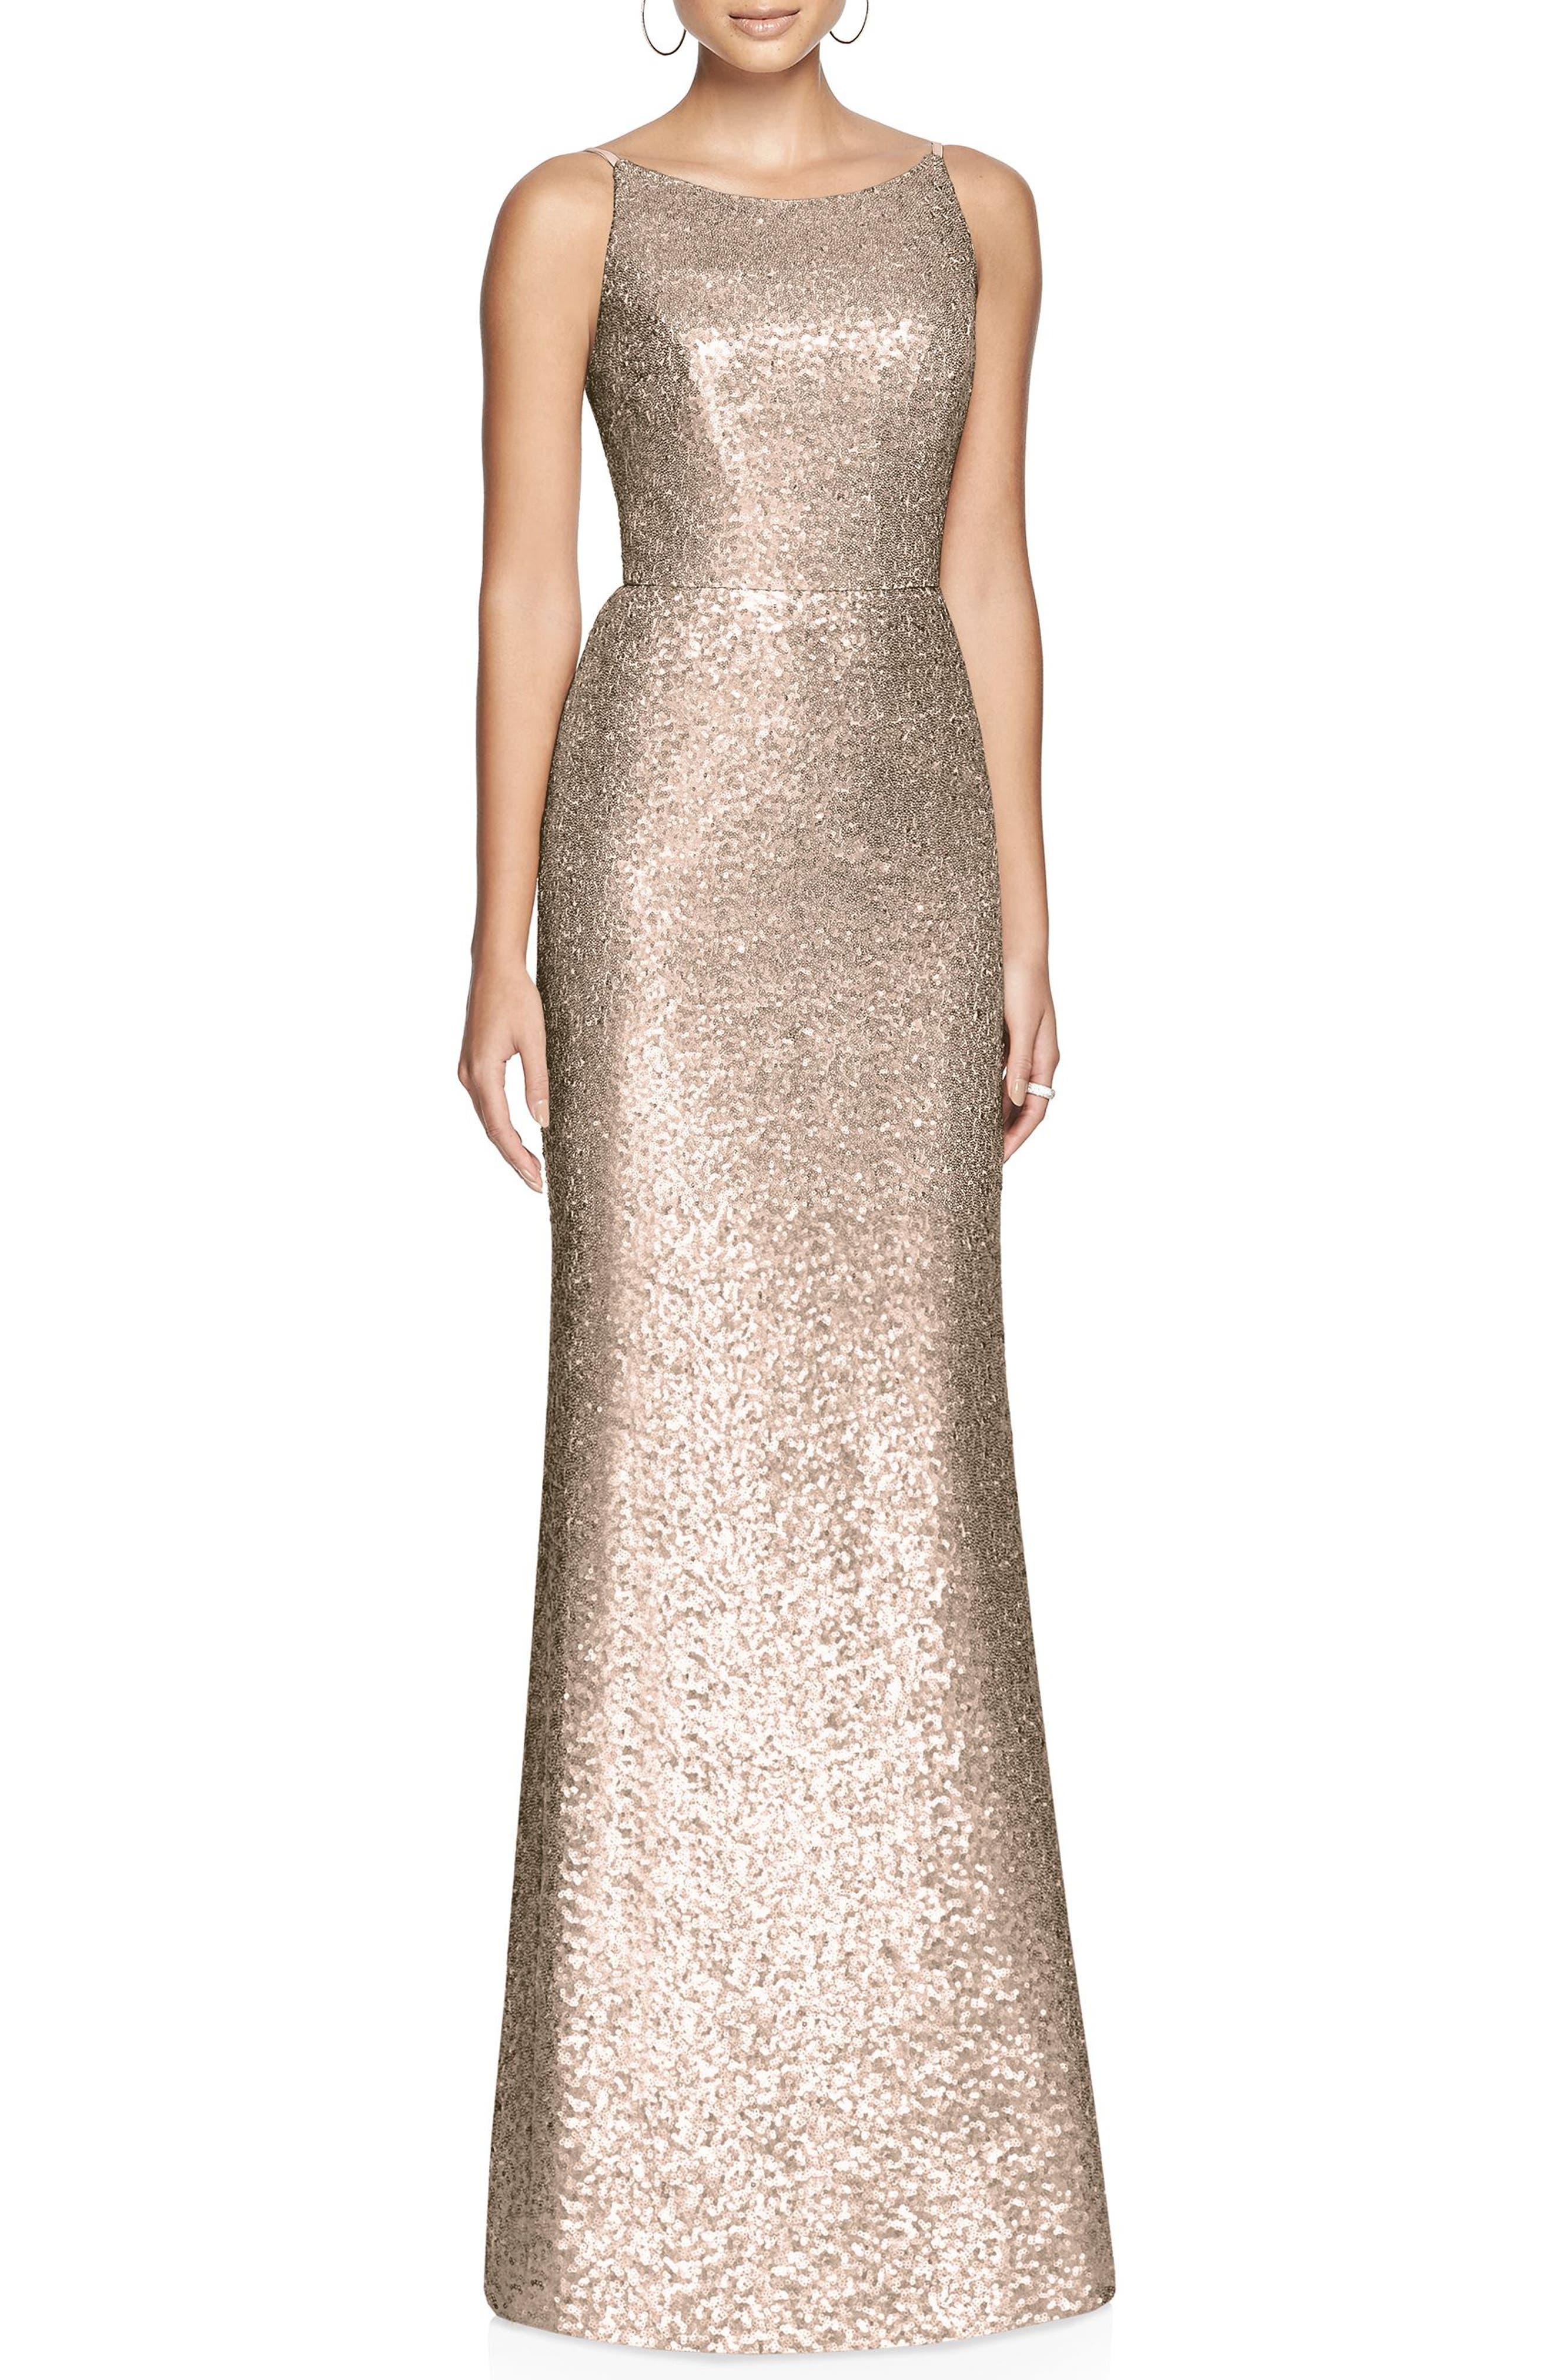 Dessy Collection Bateau Neck Sequin Gown, Metallic